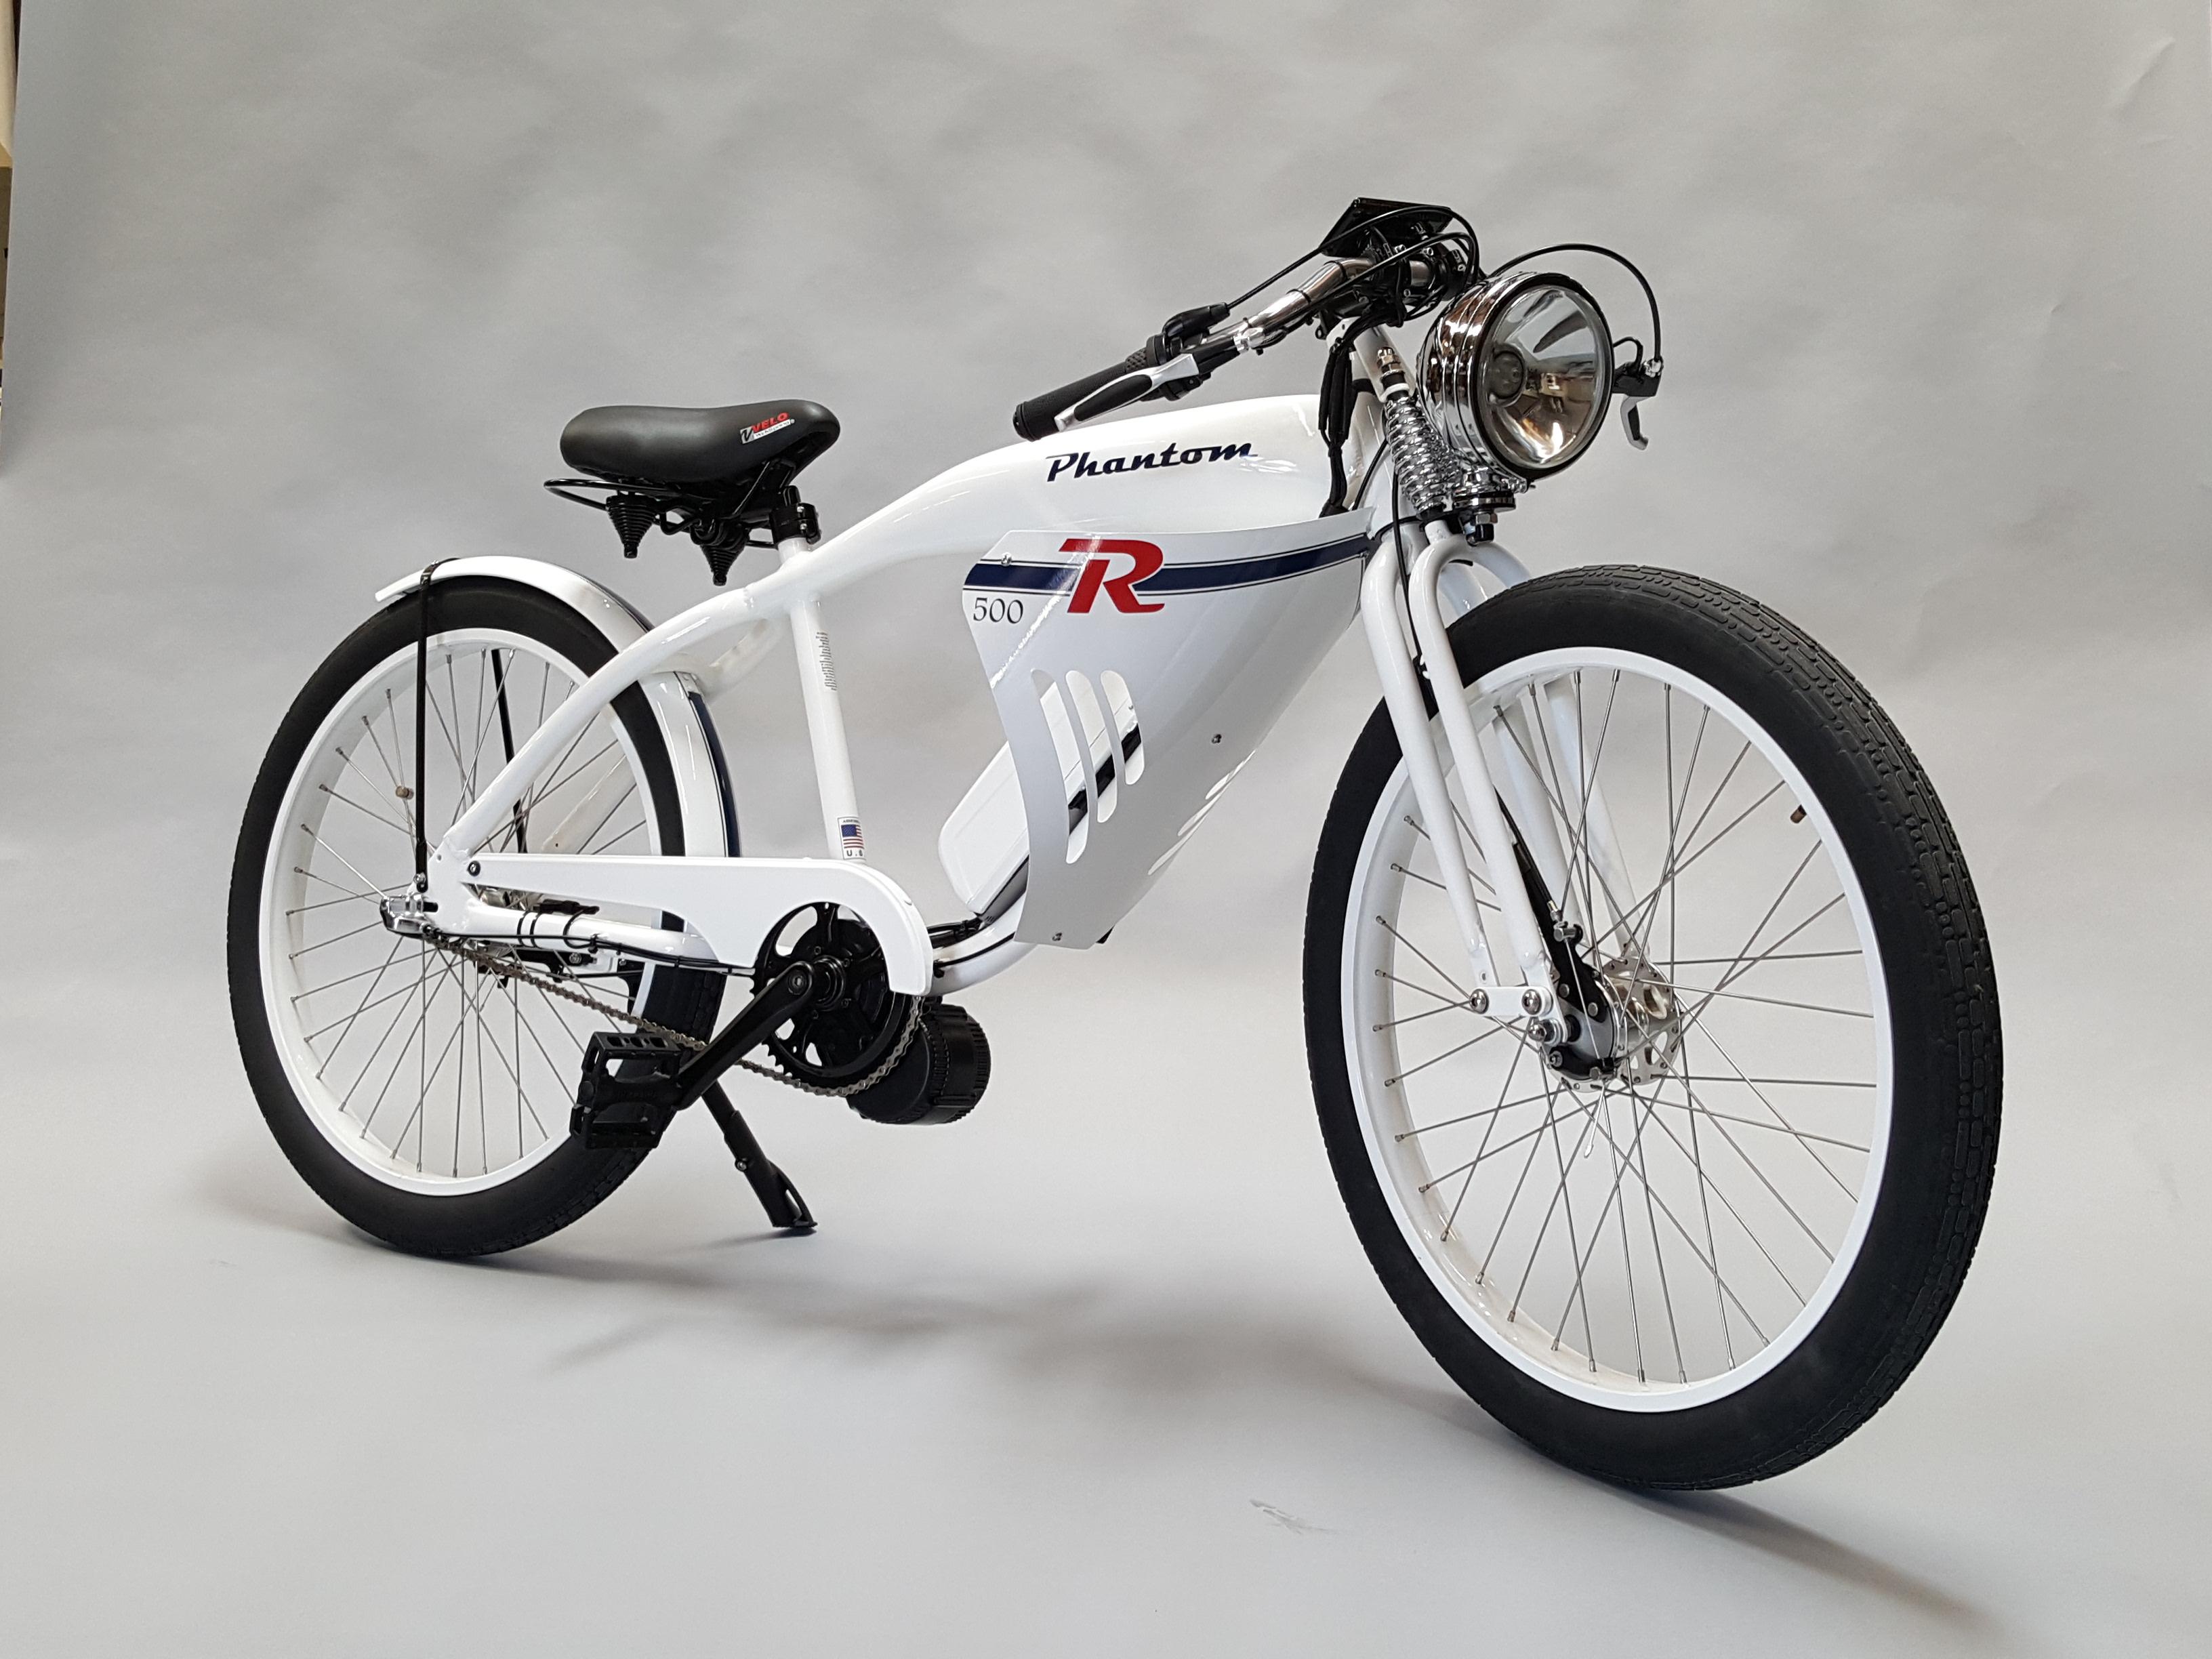 20170317 105232 phantom bikes. Black Bedroom Furniture Sets. Home Design Ideas